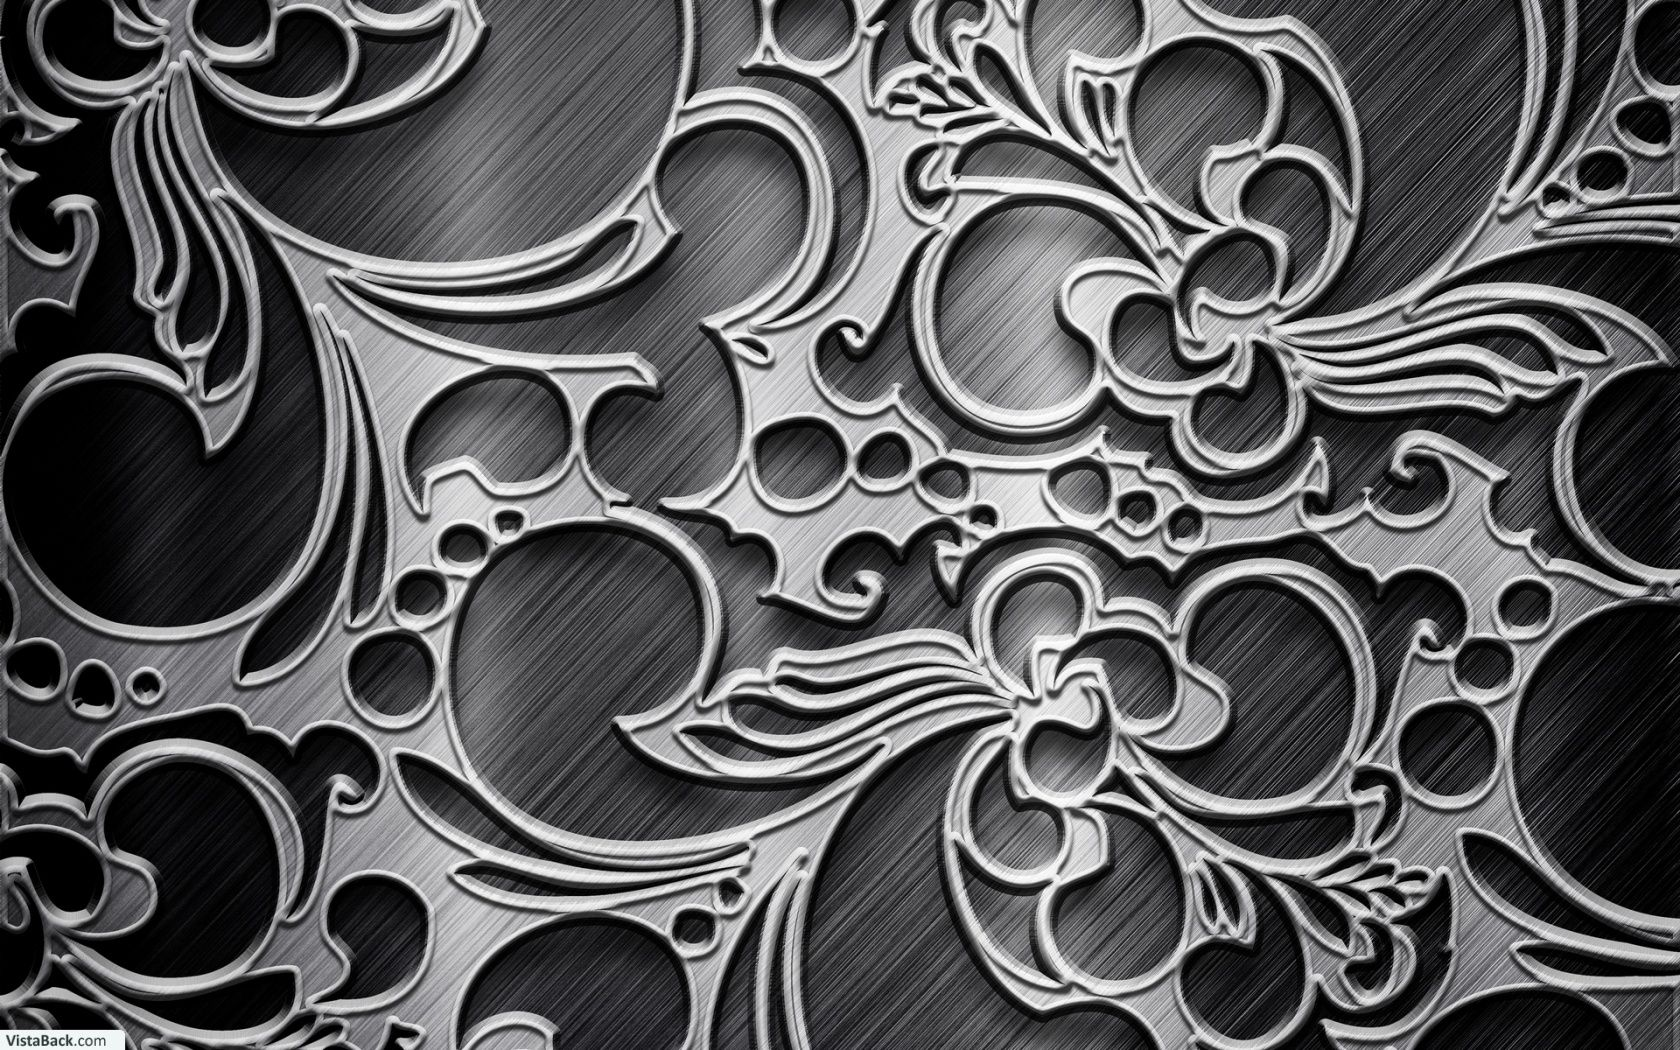 Texture Metallic Black Silver Pattern Wallpaper With 1680x1050 Silver Wallpaper Black And Silver Wallpaper Pattern Wallpaper